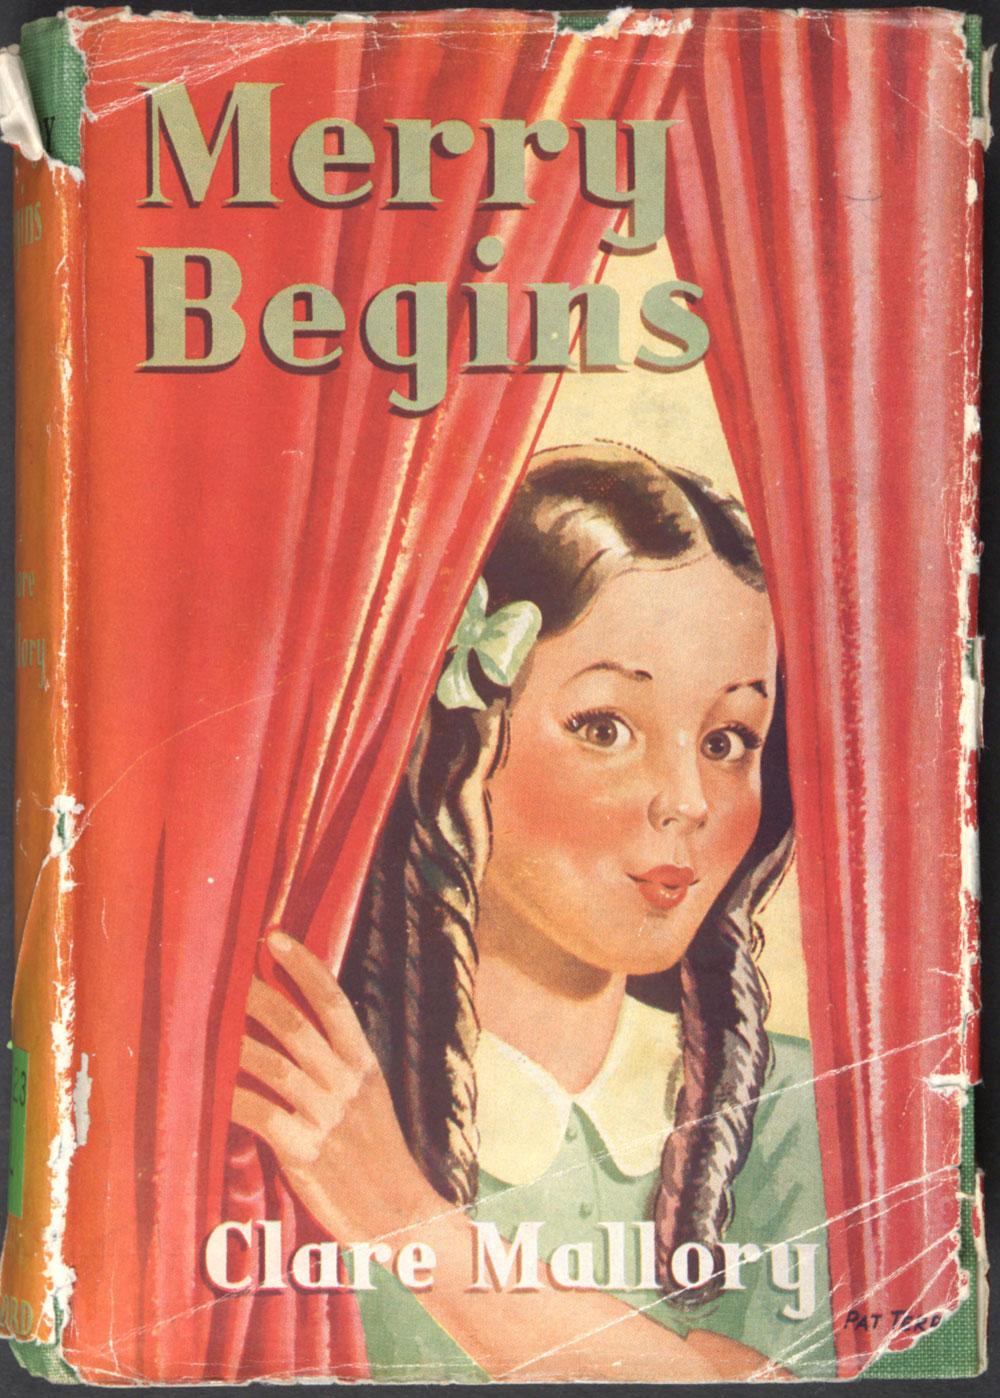 Clare Mallory. <em>Merry begins</em>. Melbourne: Oxford University Press, 1947.